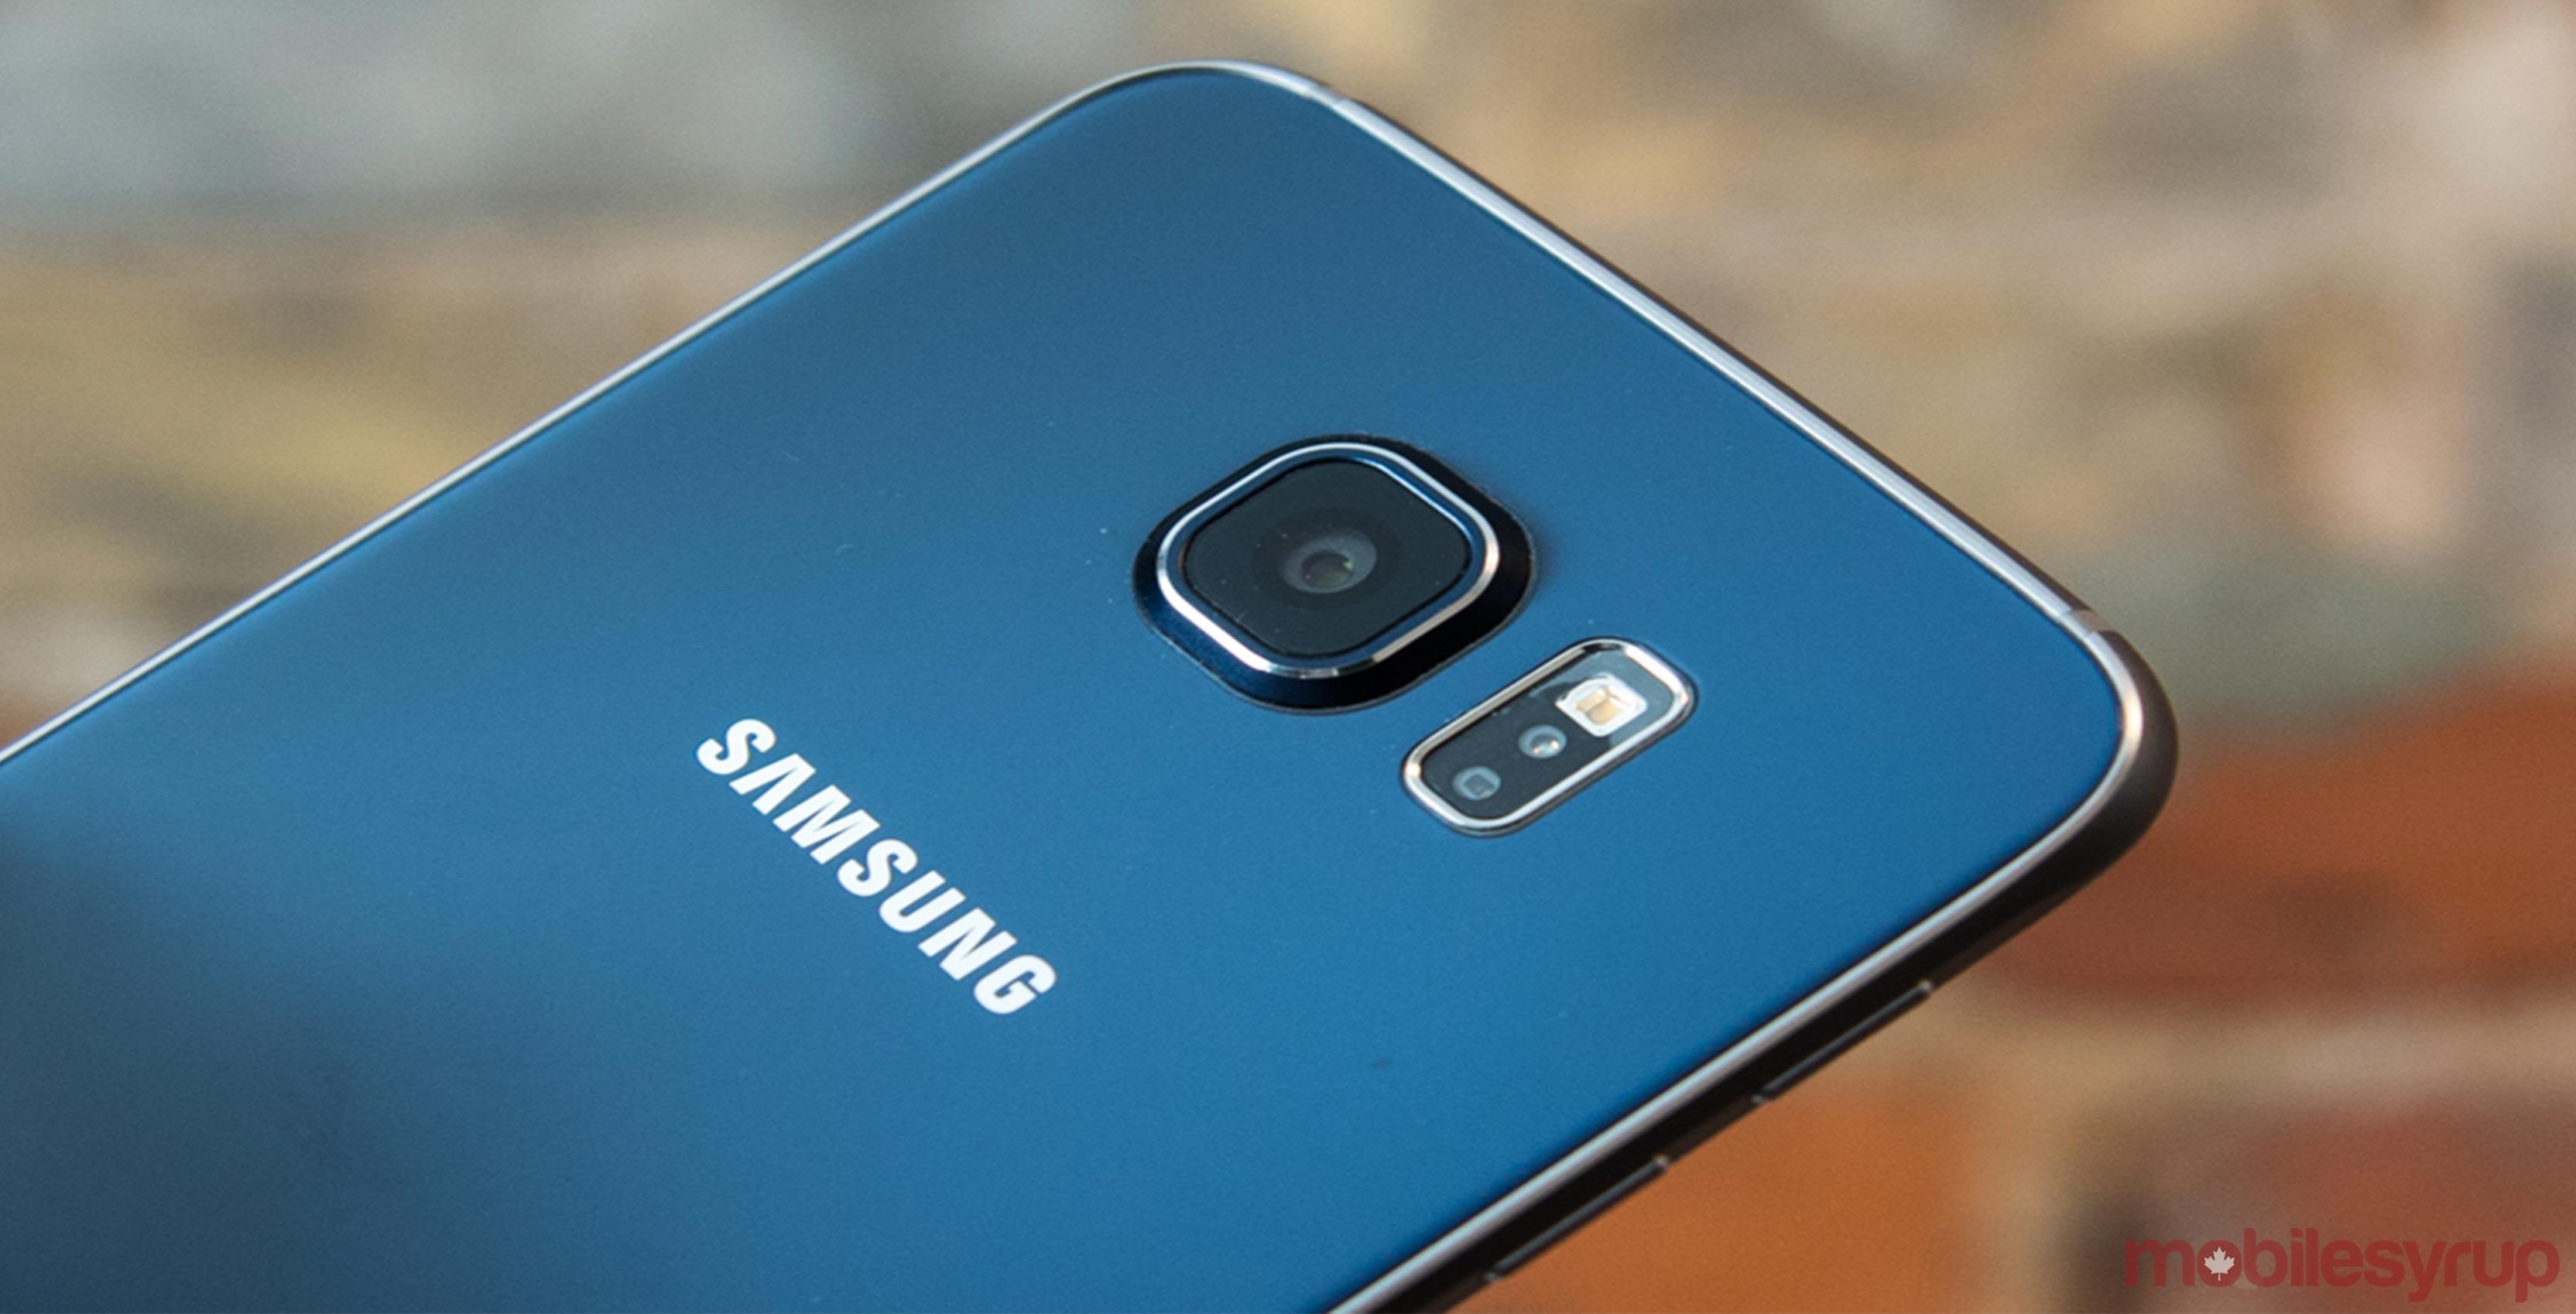 Telus Samsung Galaxy S6 rear